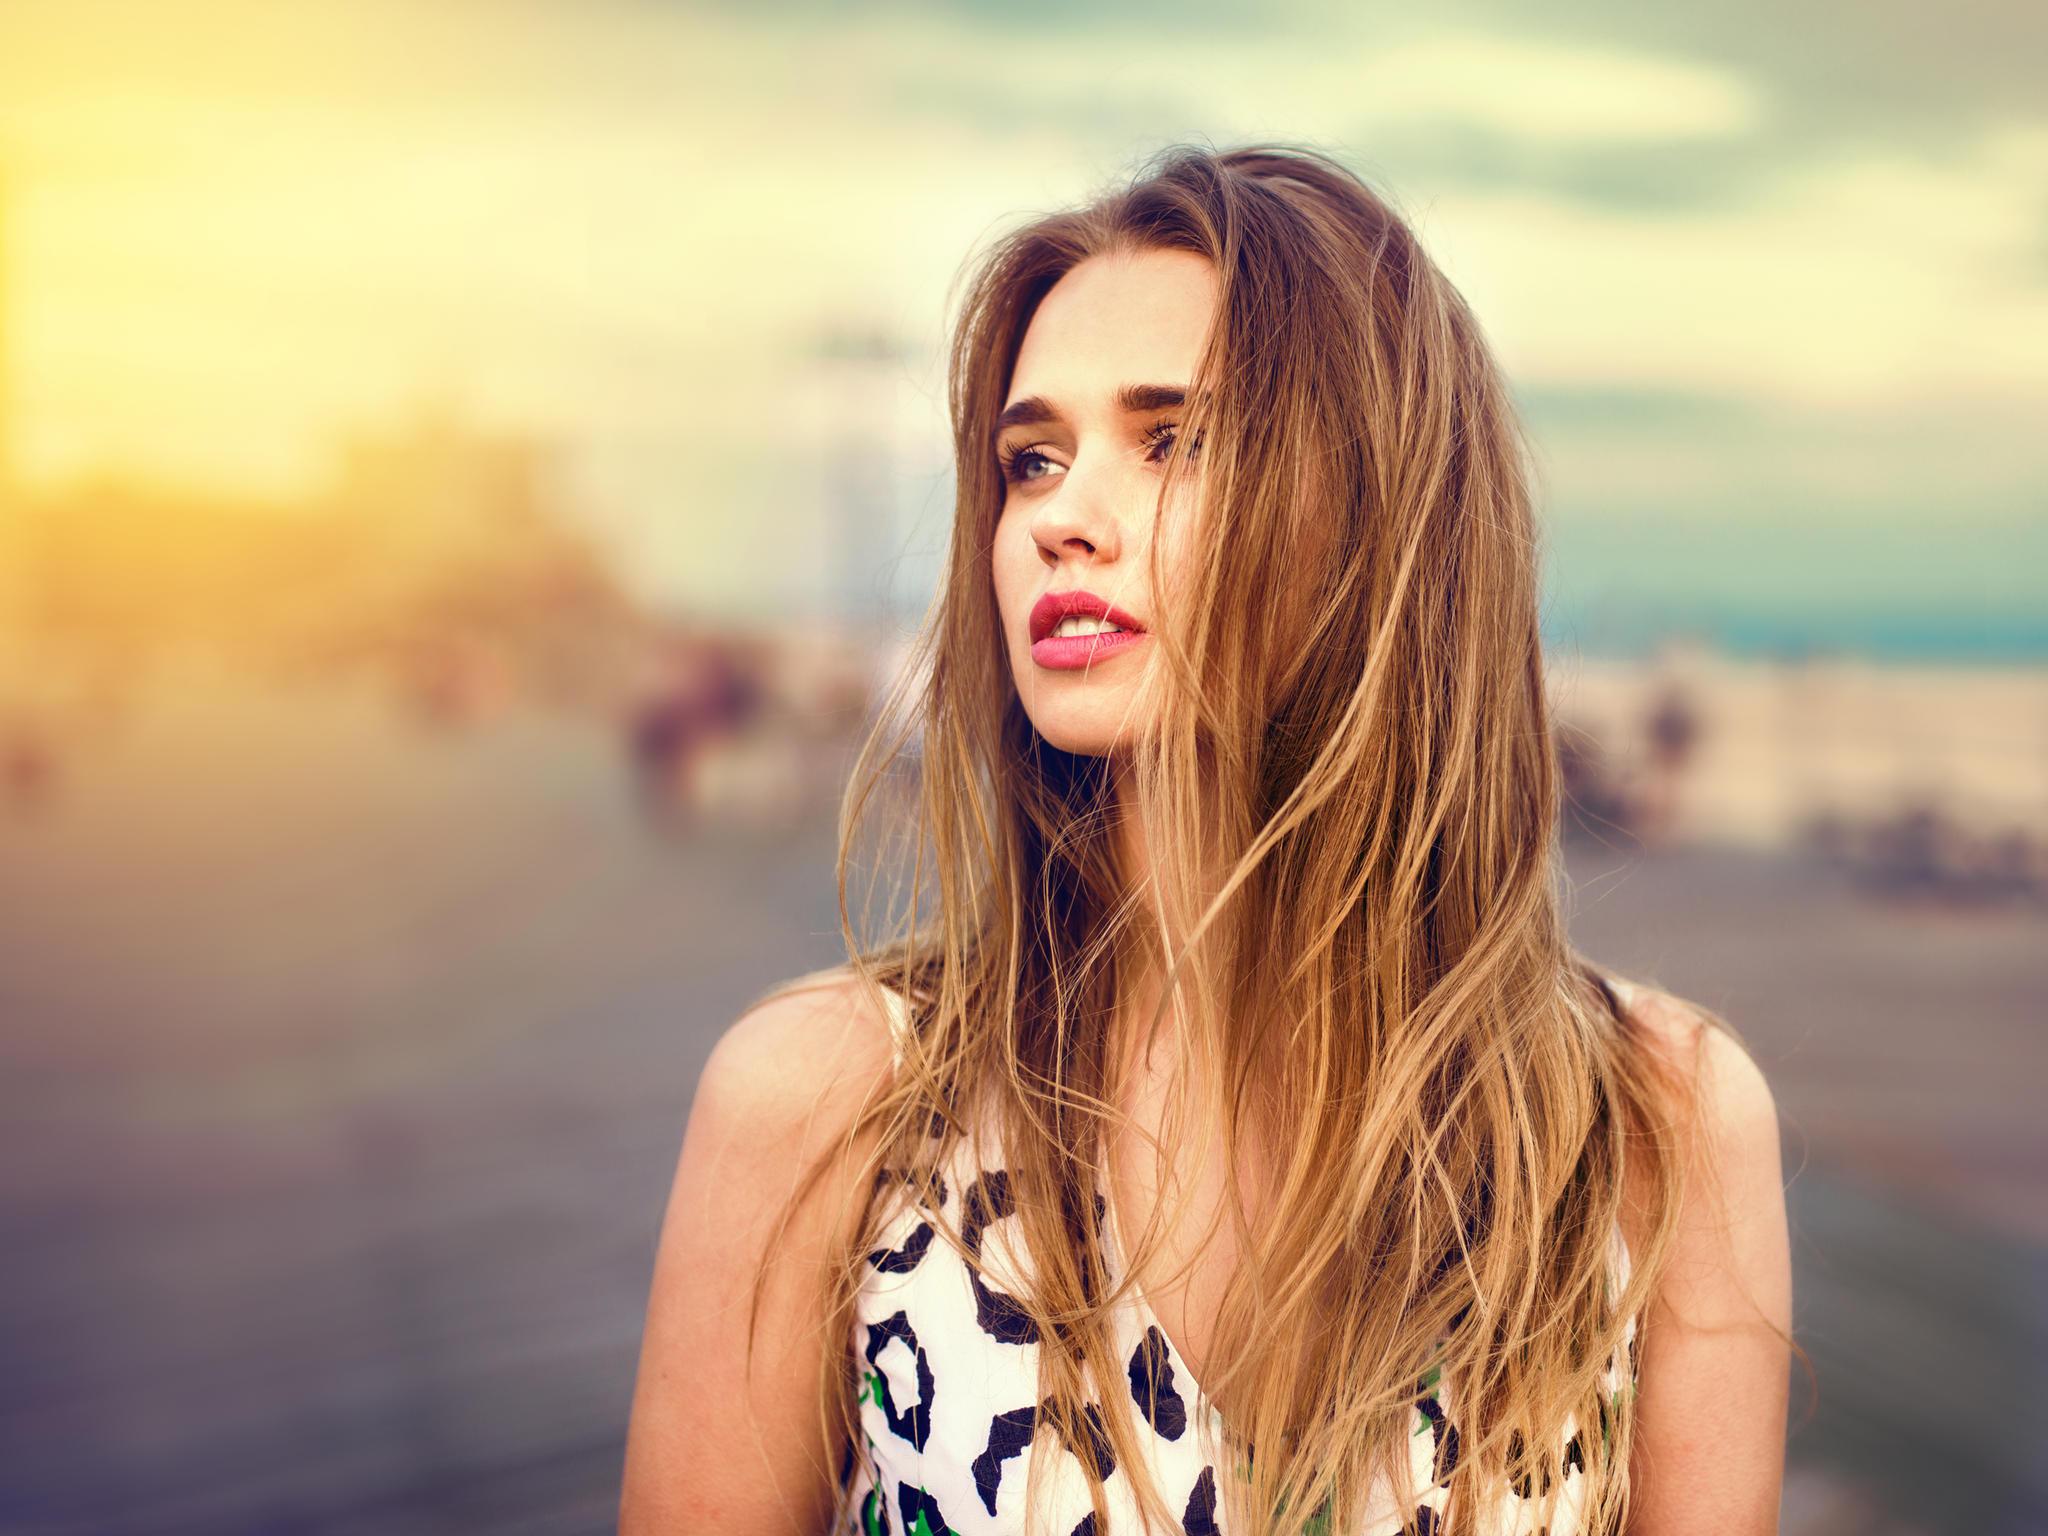 Der Haarschnitt: Großzügiger Stufenschnitt